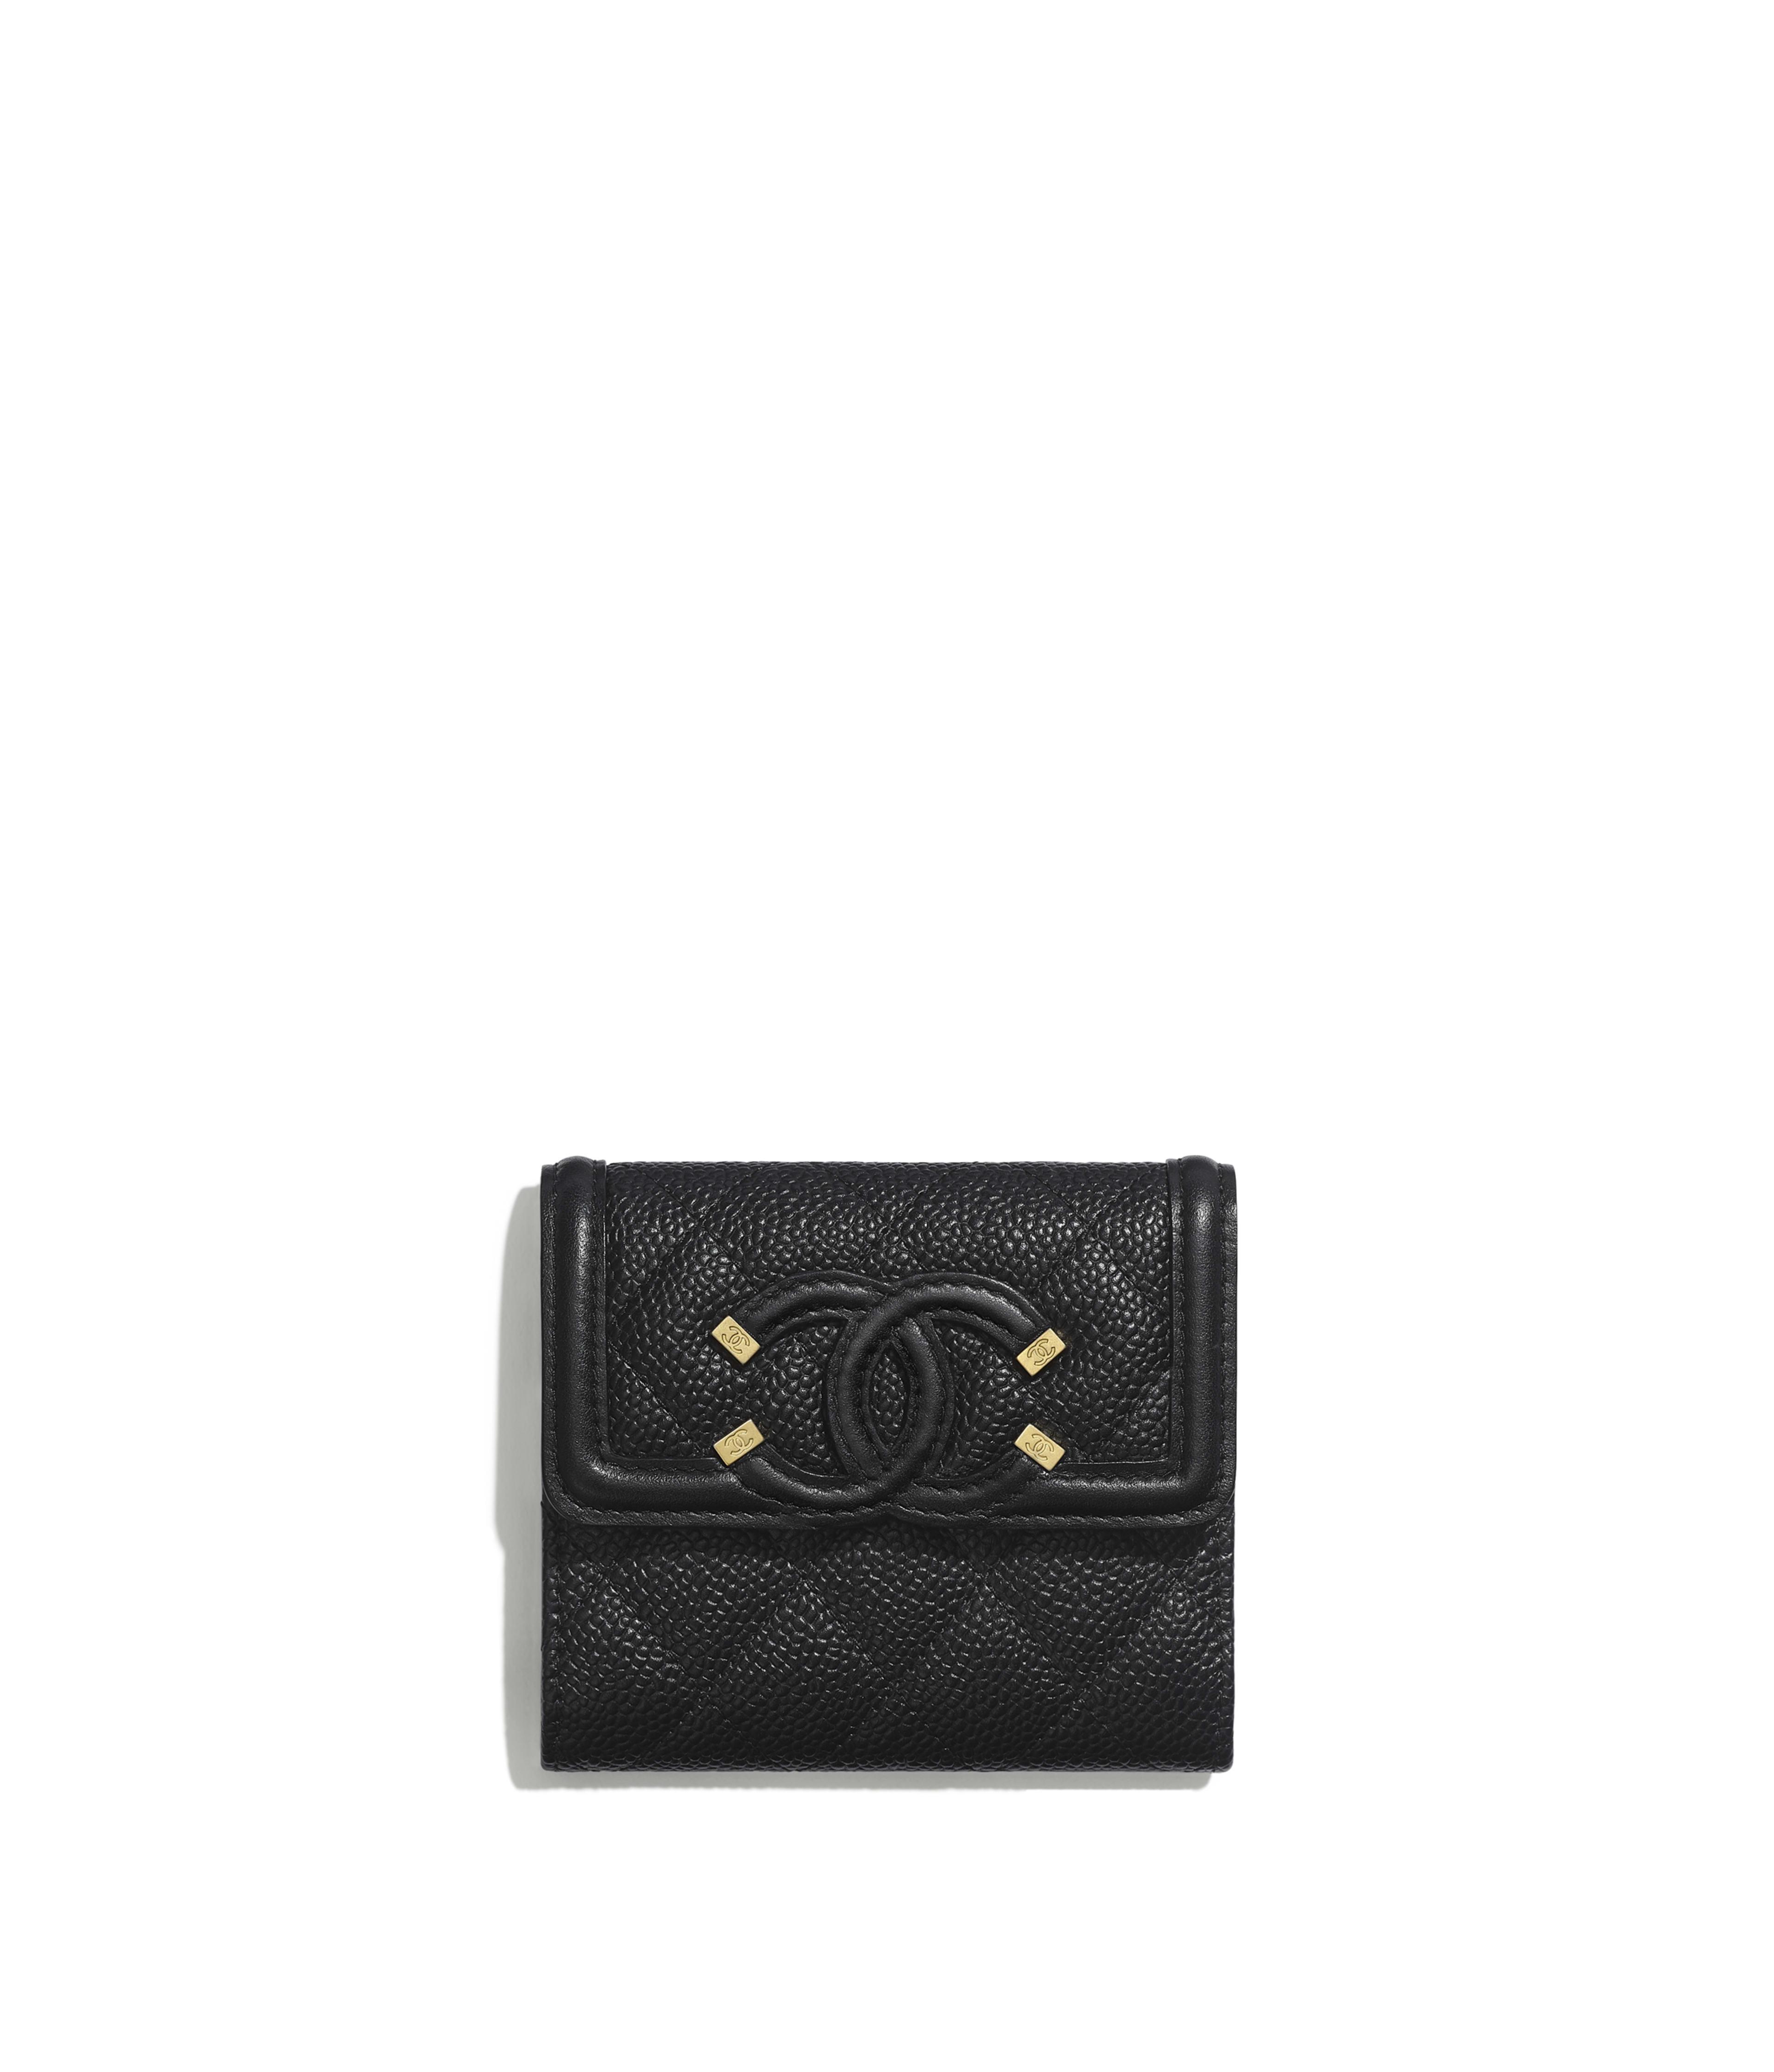 a90f19e55b02e8 Small Flap Wallet Grained Calfskin, Smooth Calfskin & Gold-Tone Metal, Black  Ref. A81941Y6054294305